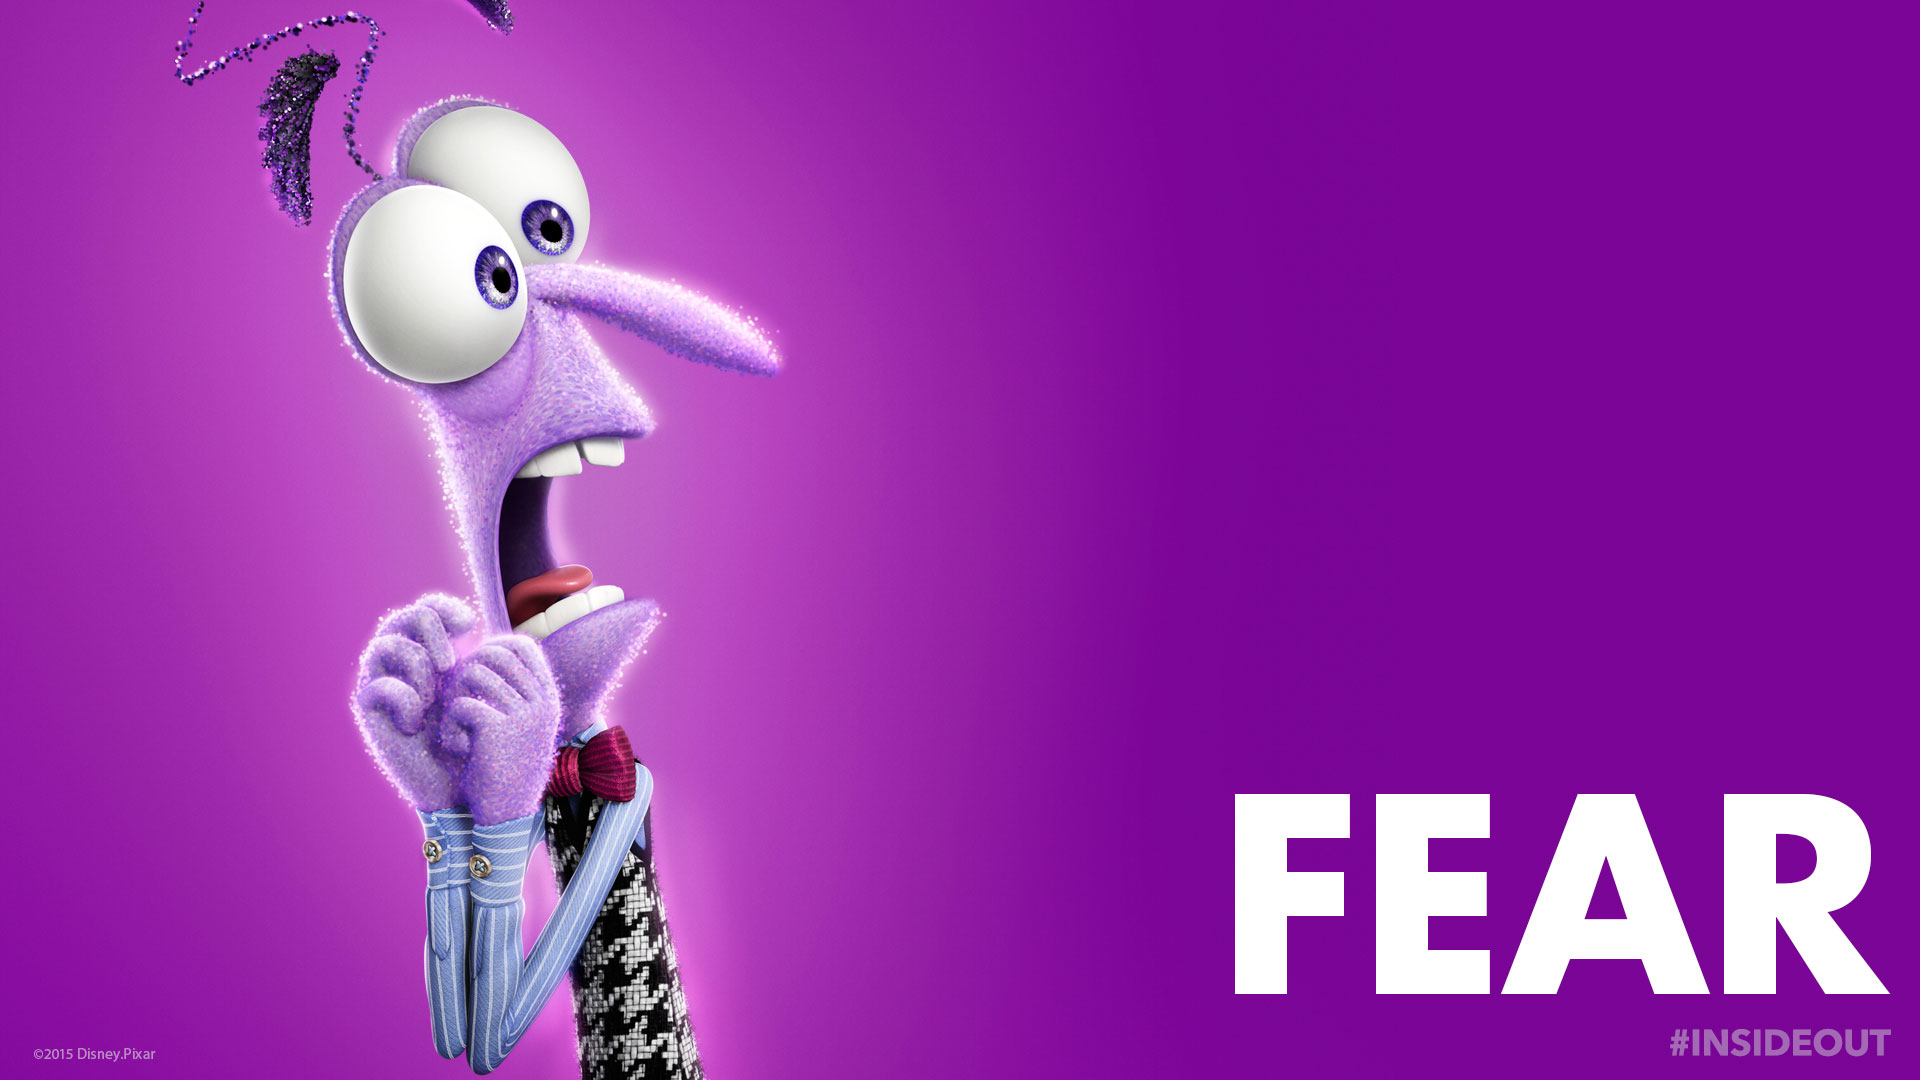 Disney Movie Inside Out 2015 Desktop Backgrounds & iPhone 6.